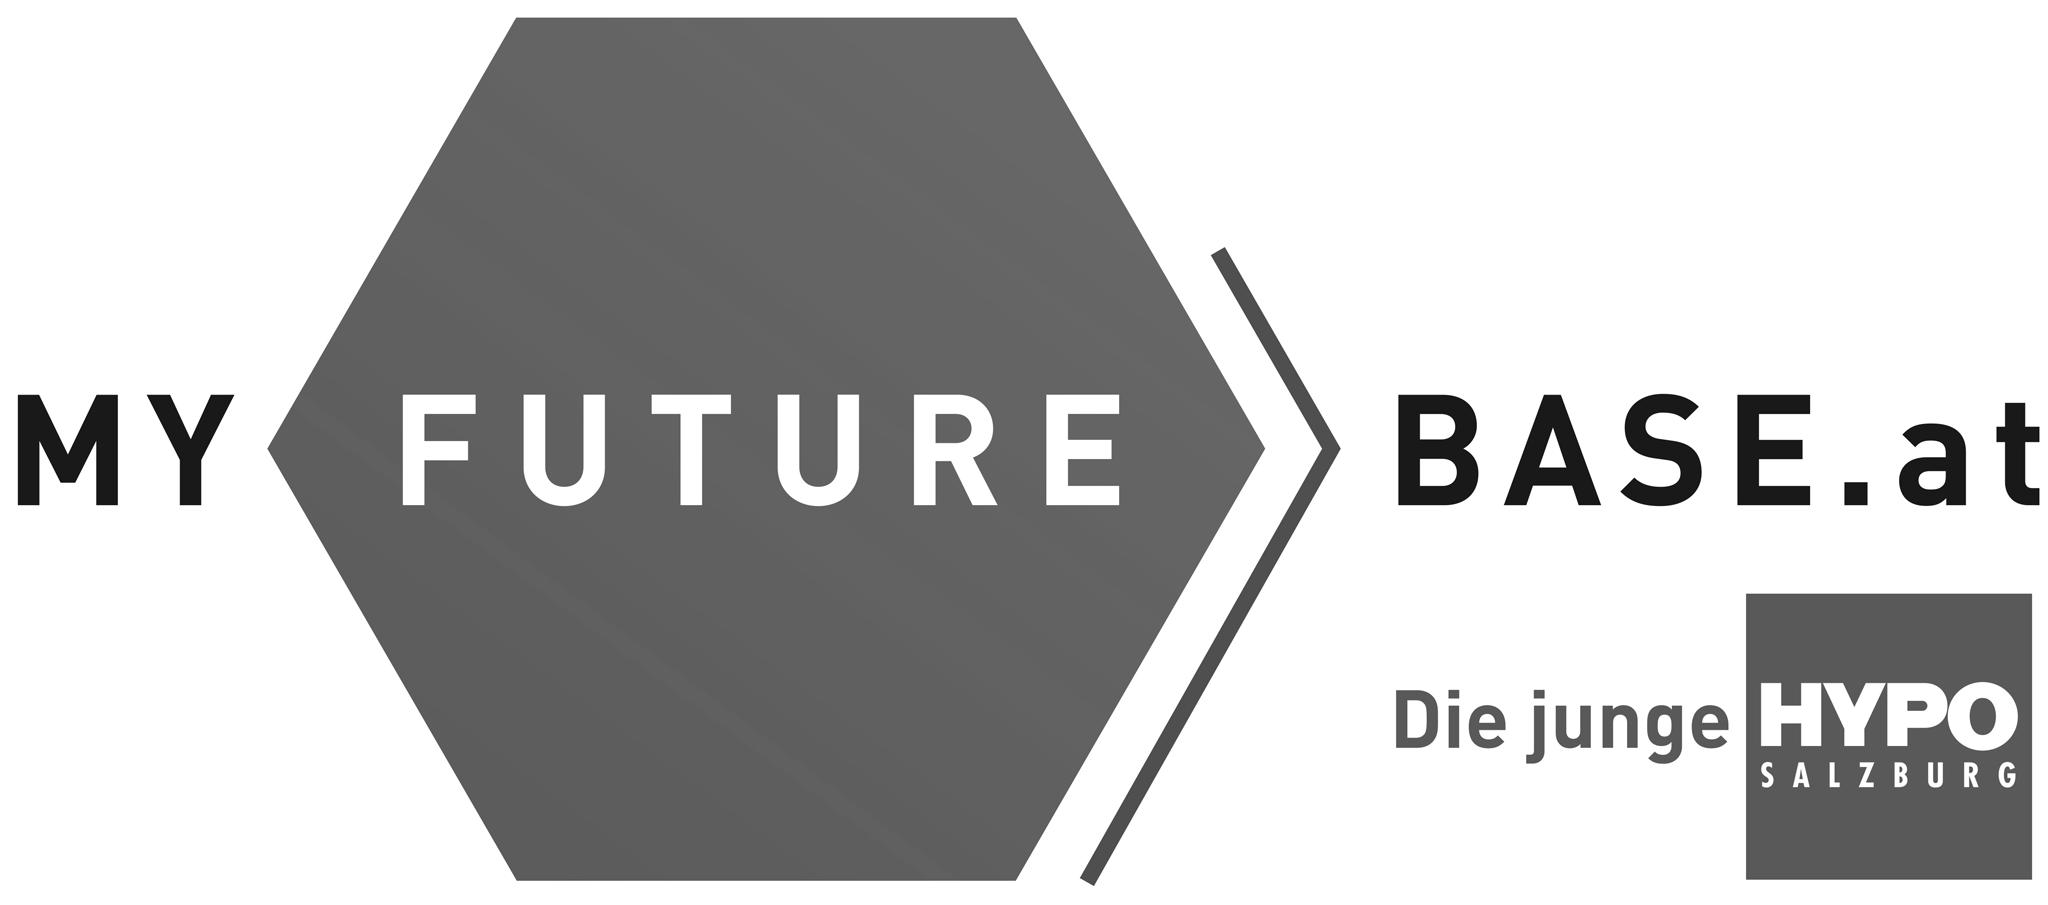 Logo Myfuturebase